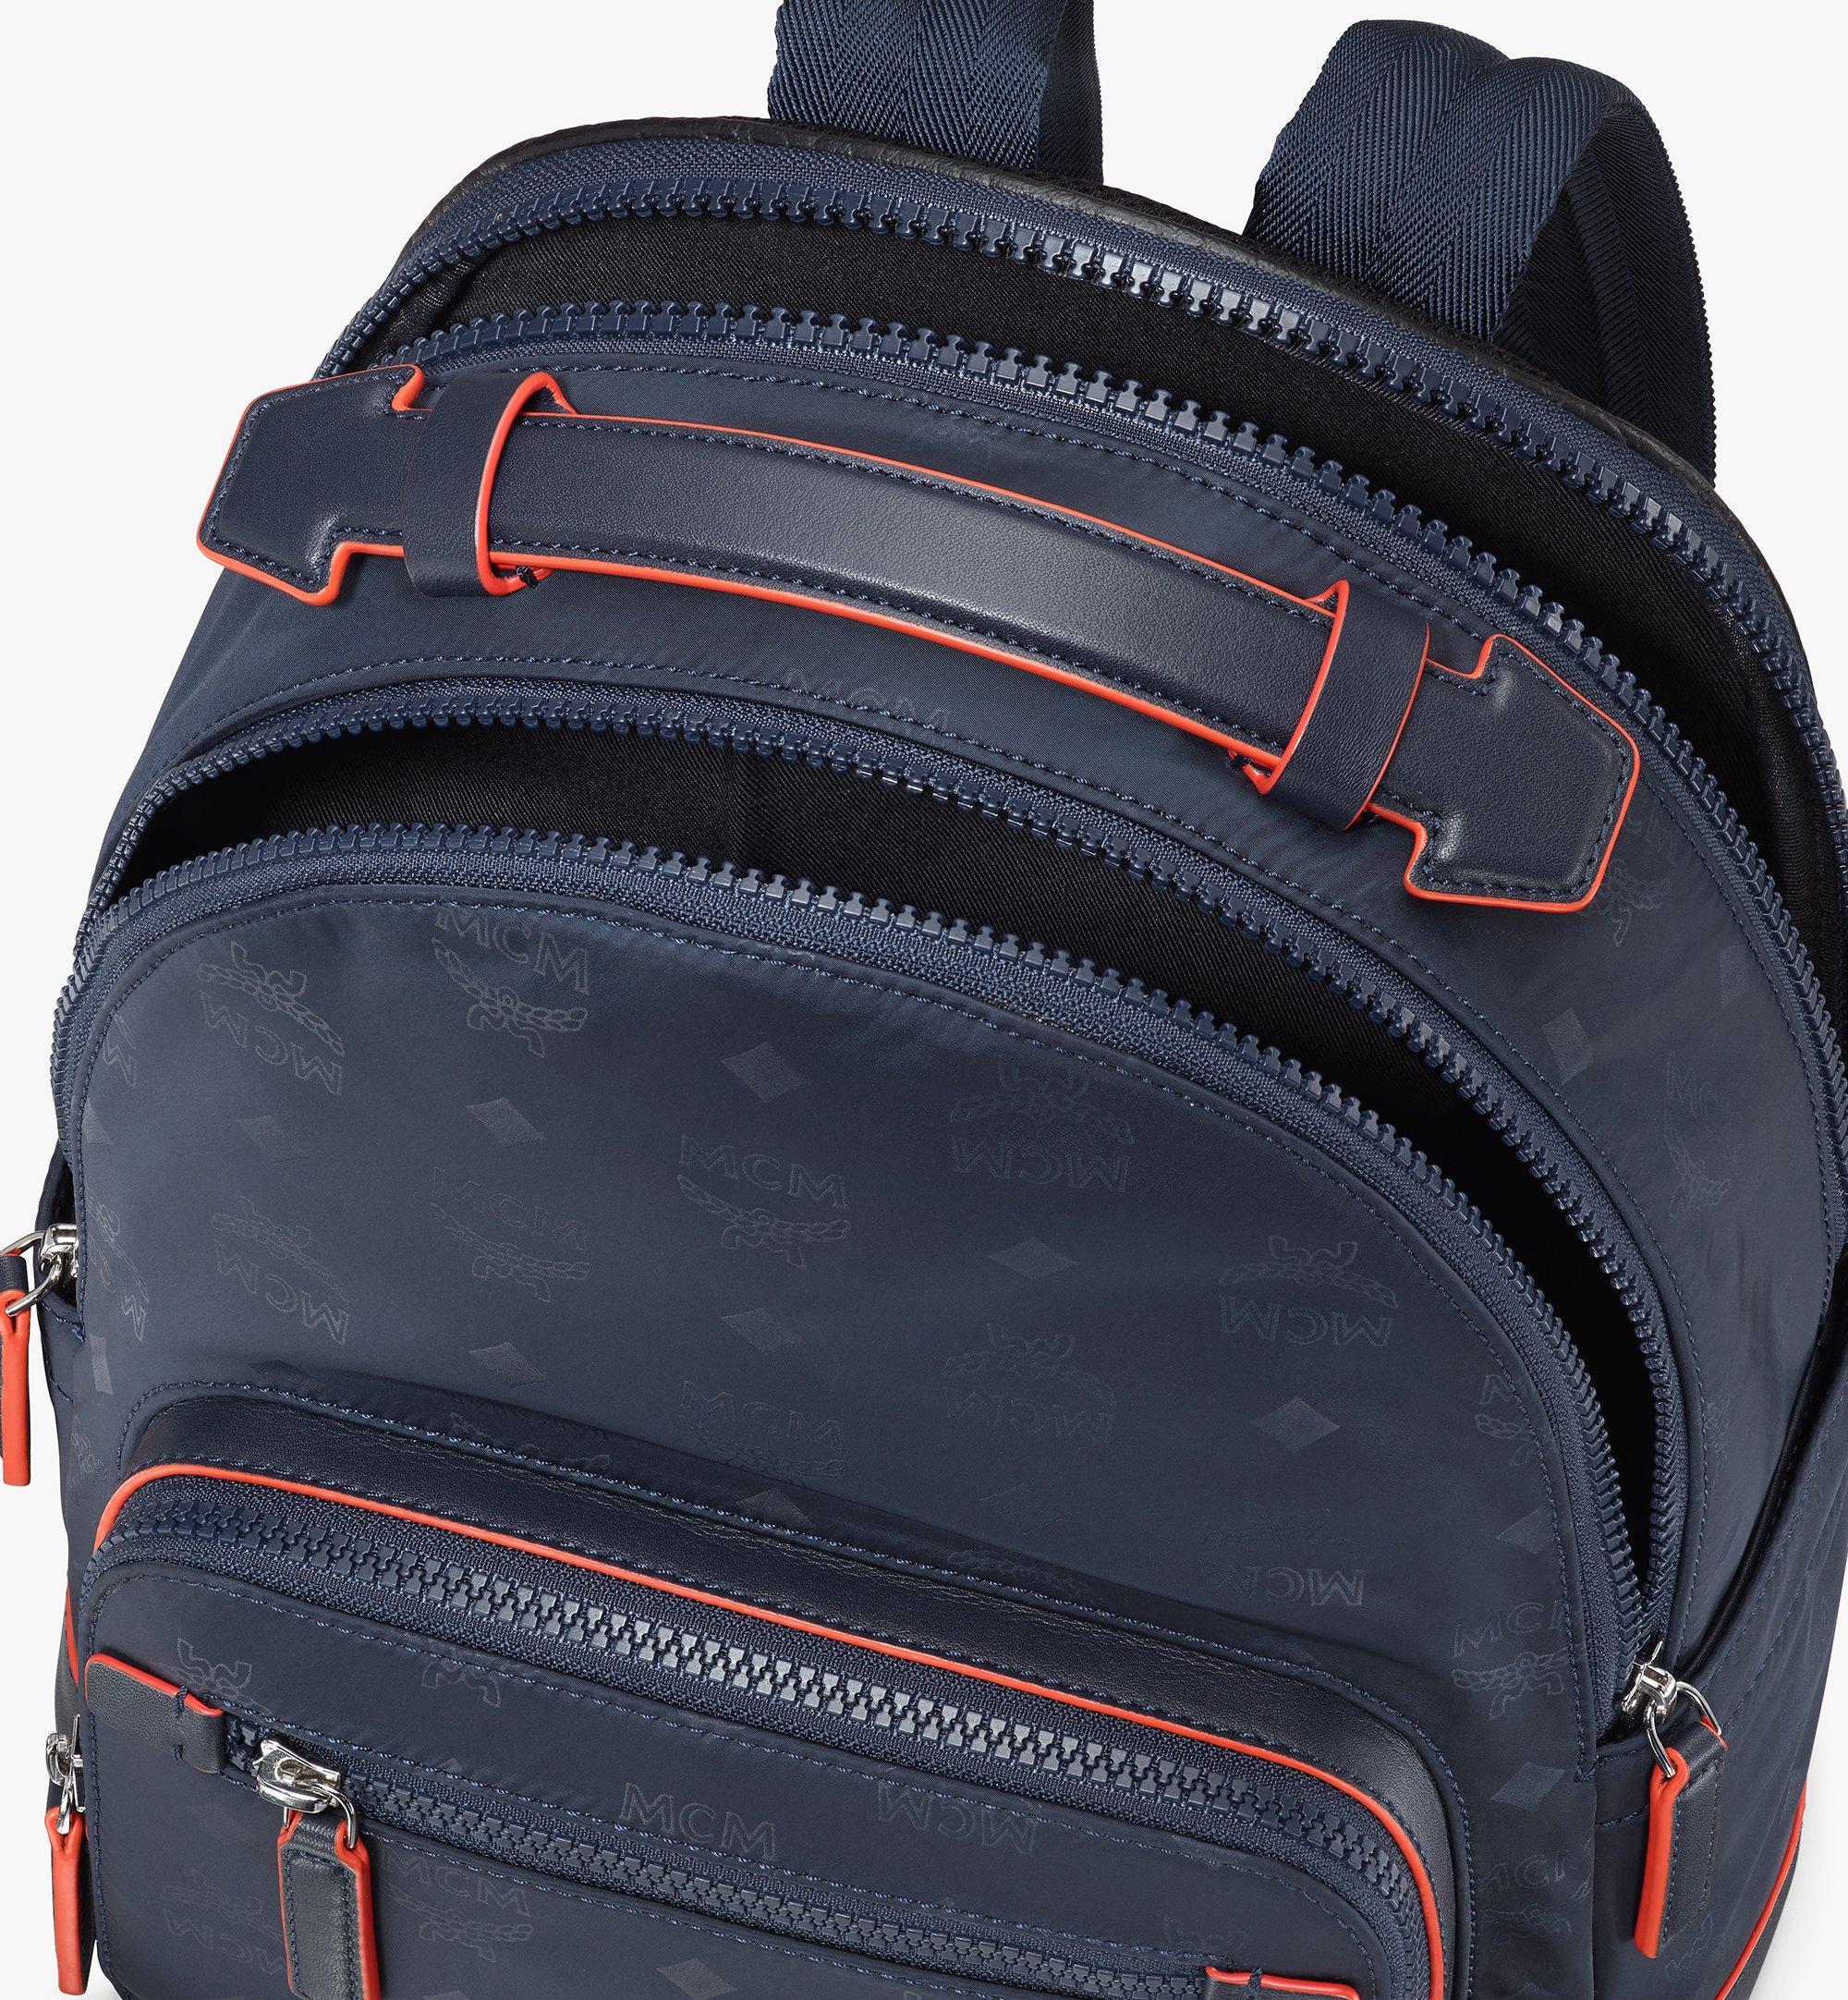 MCM Stark Backpack in Monogram Nylon Navy MMKASVE25VA001 Alternate View 3